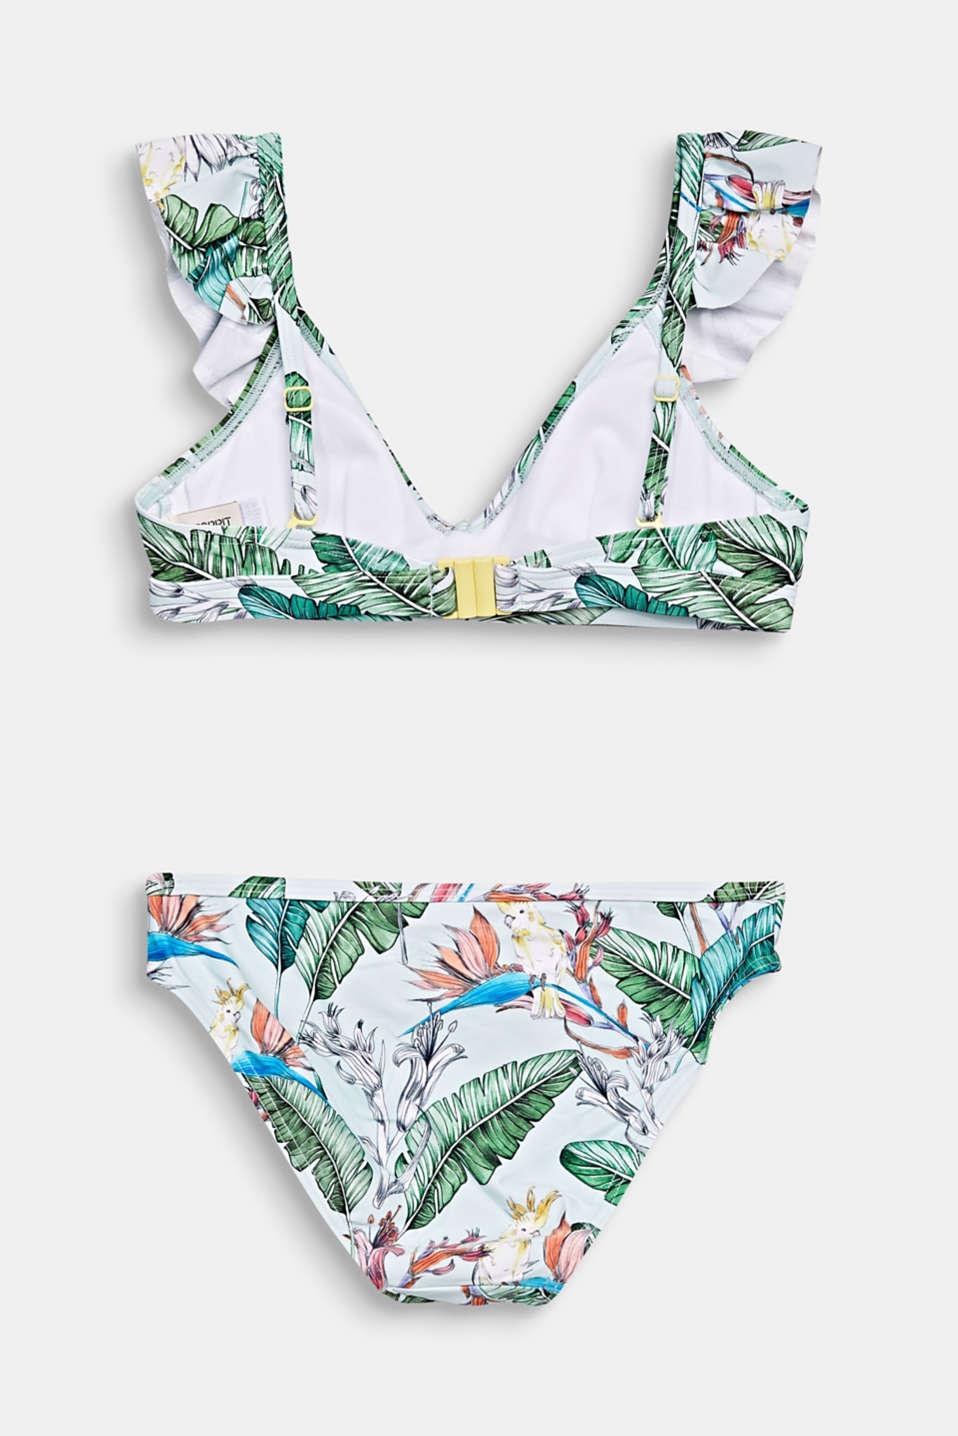 Padded crop top bikini with flounces, LIGHT AQUA GREEN, detail image number 1